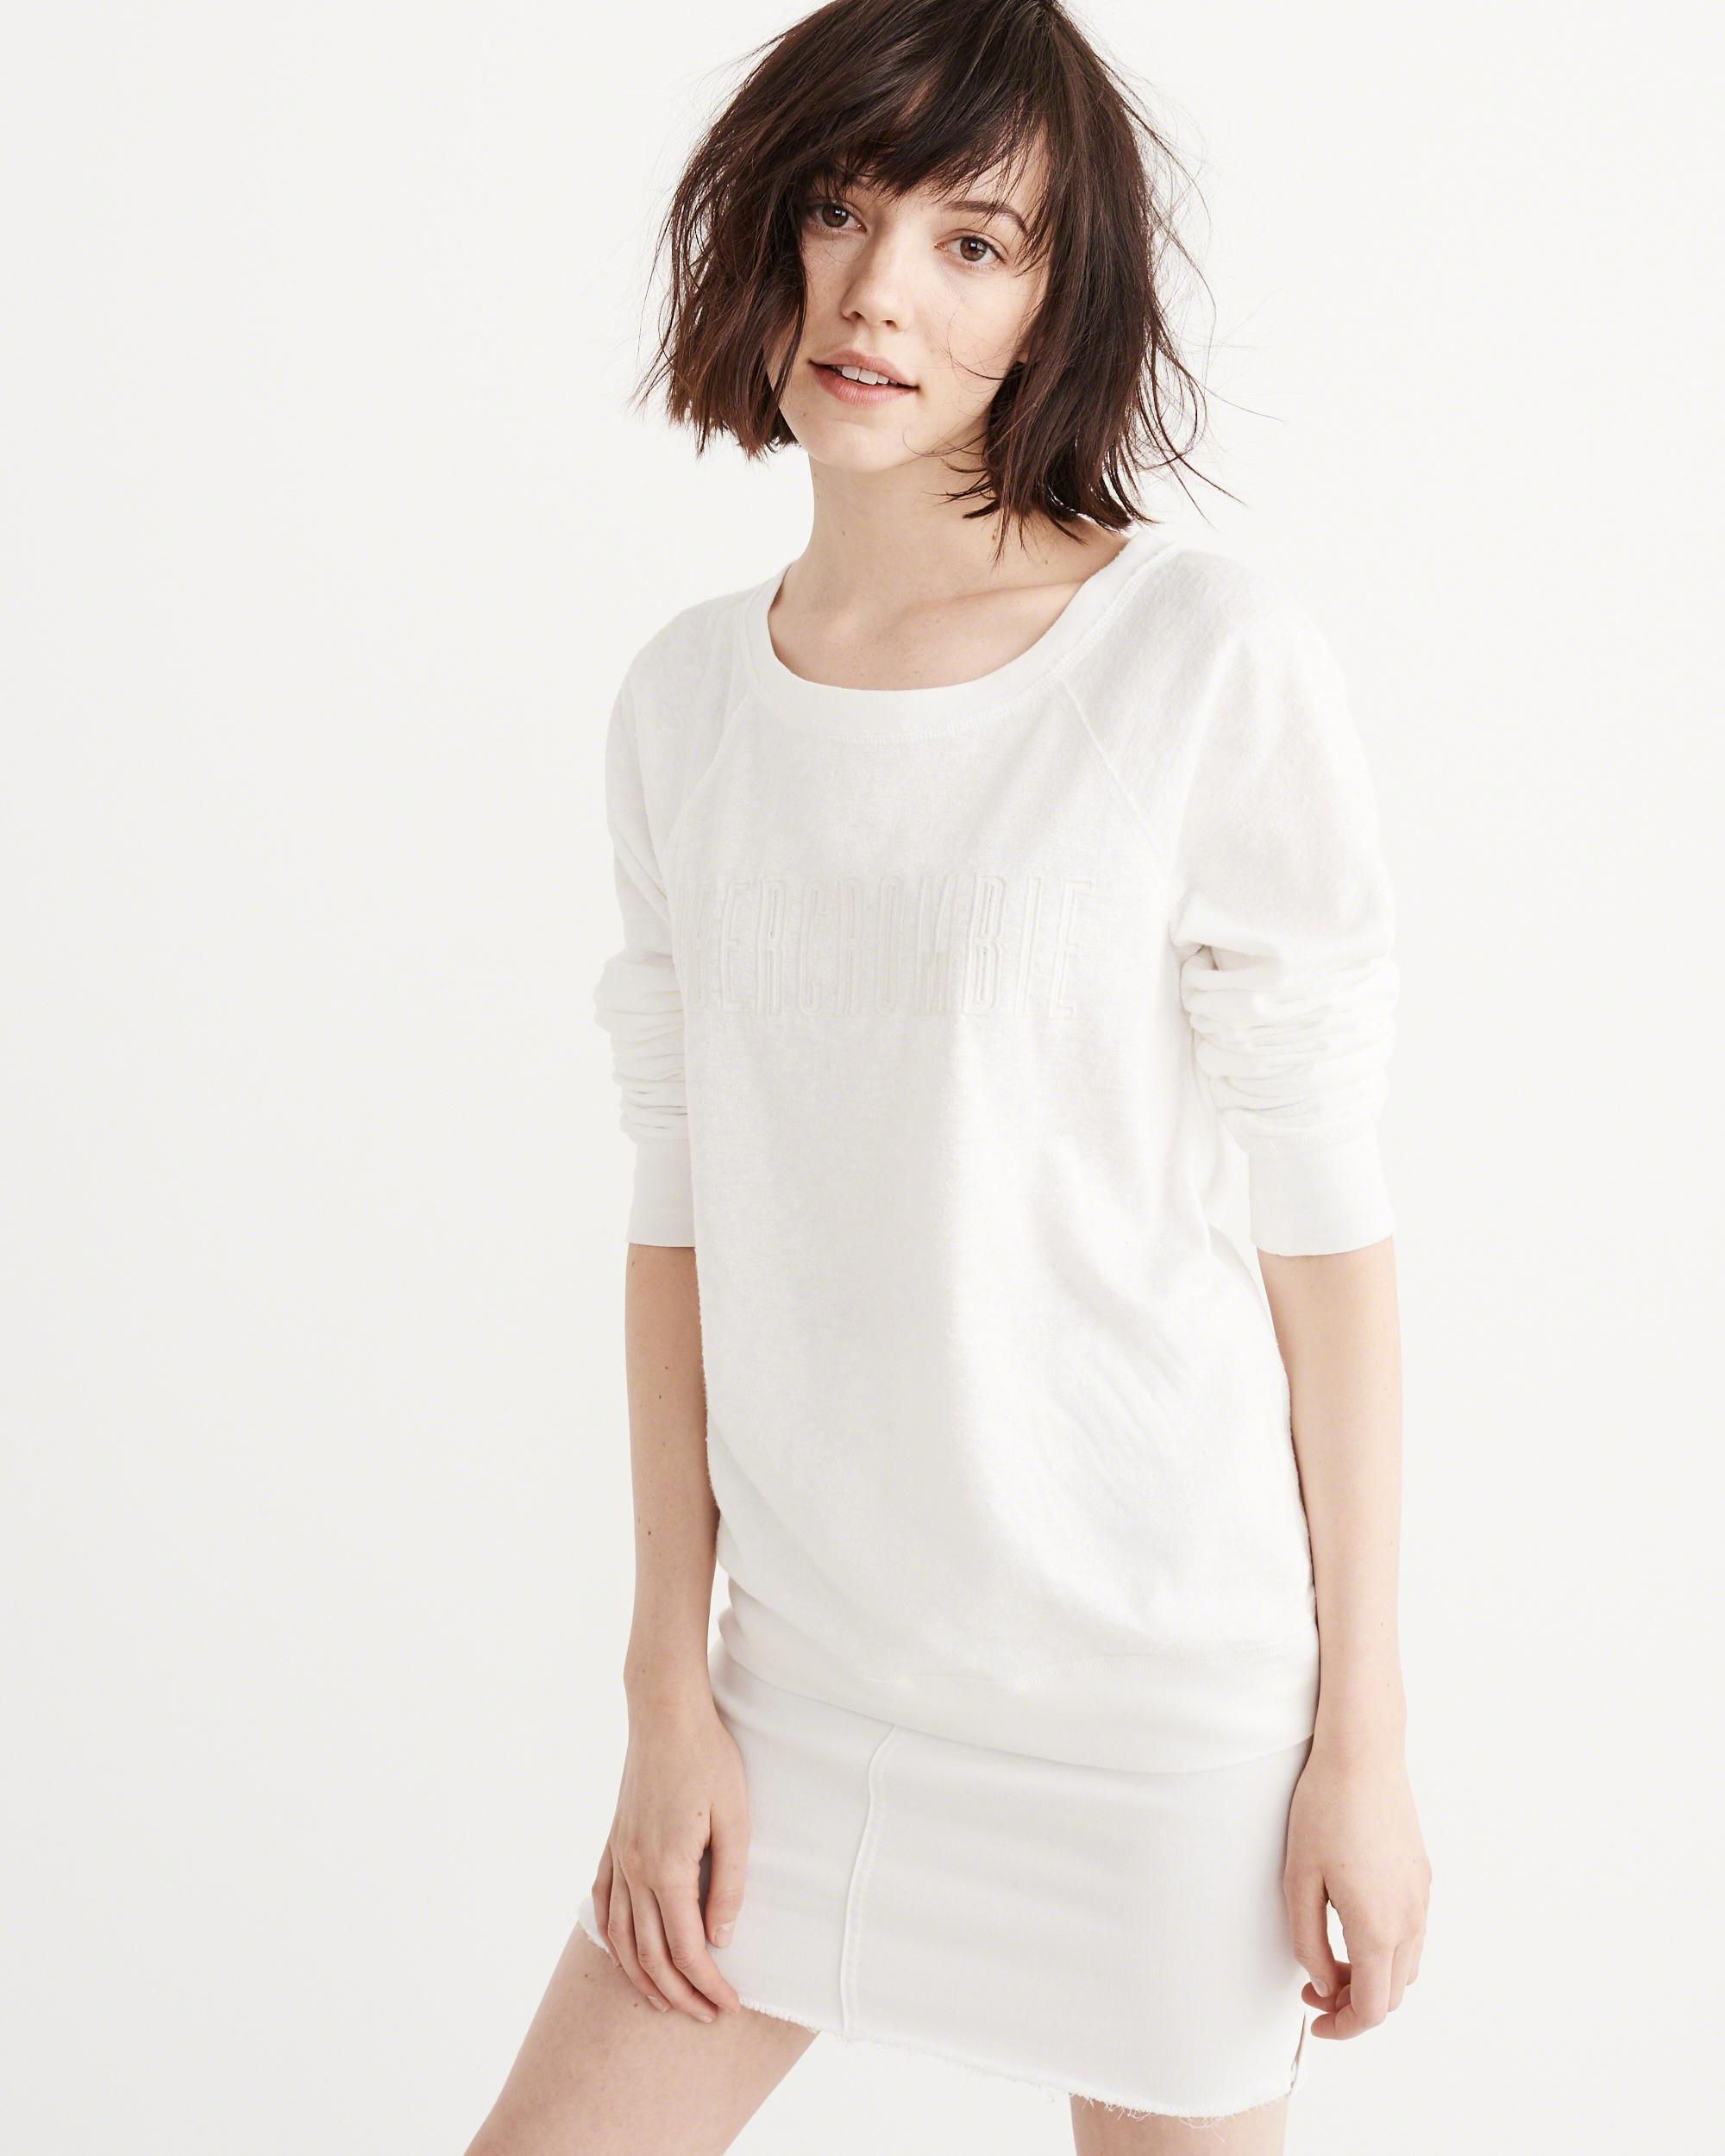 Abercrombie & fitch Logo Crew Sweatshirt in White   Lyst  Abercrombie & f...